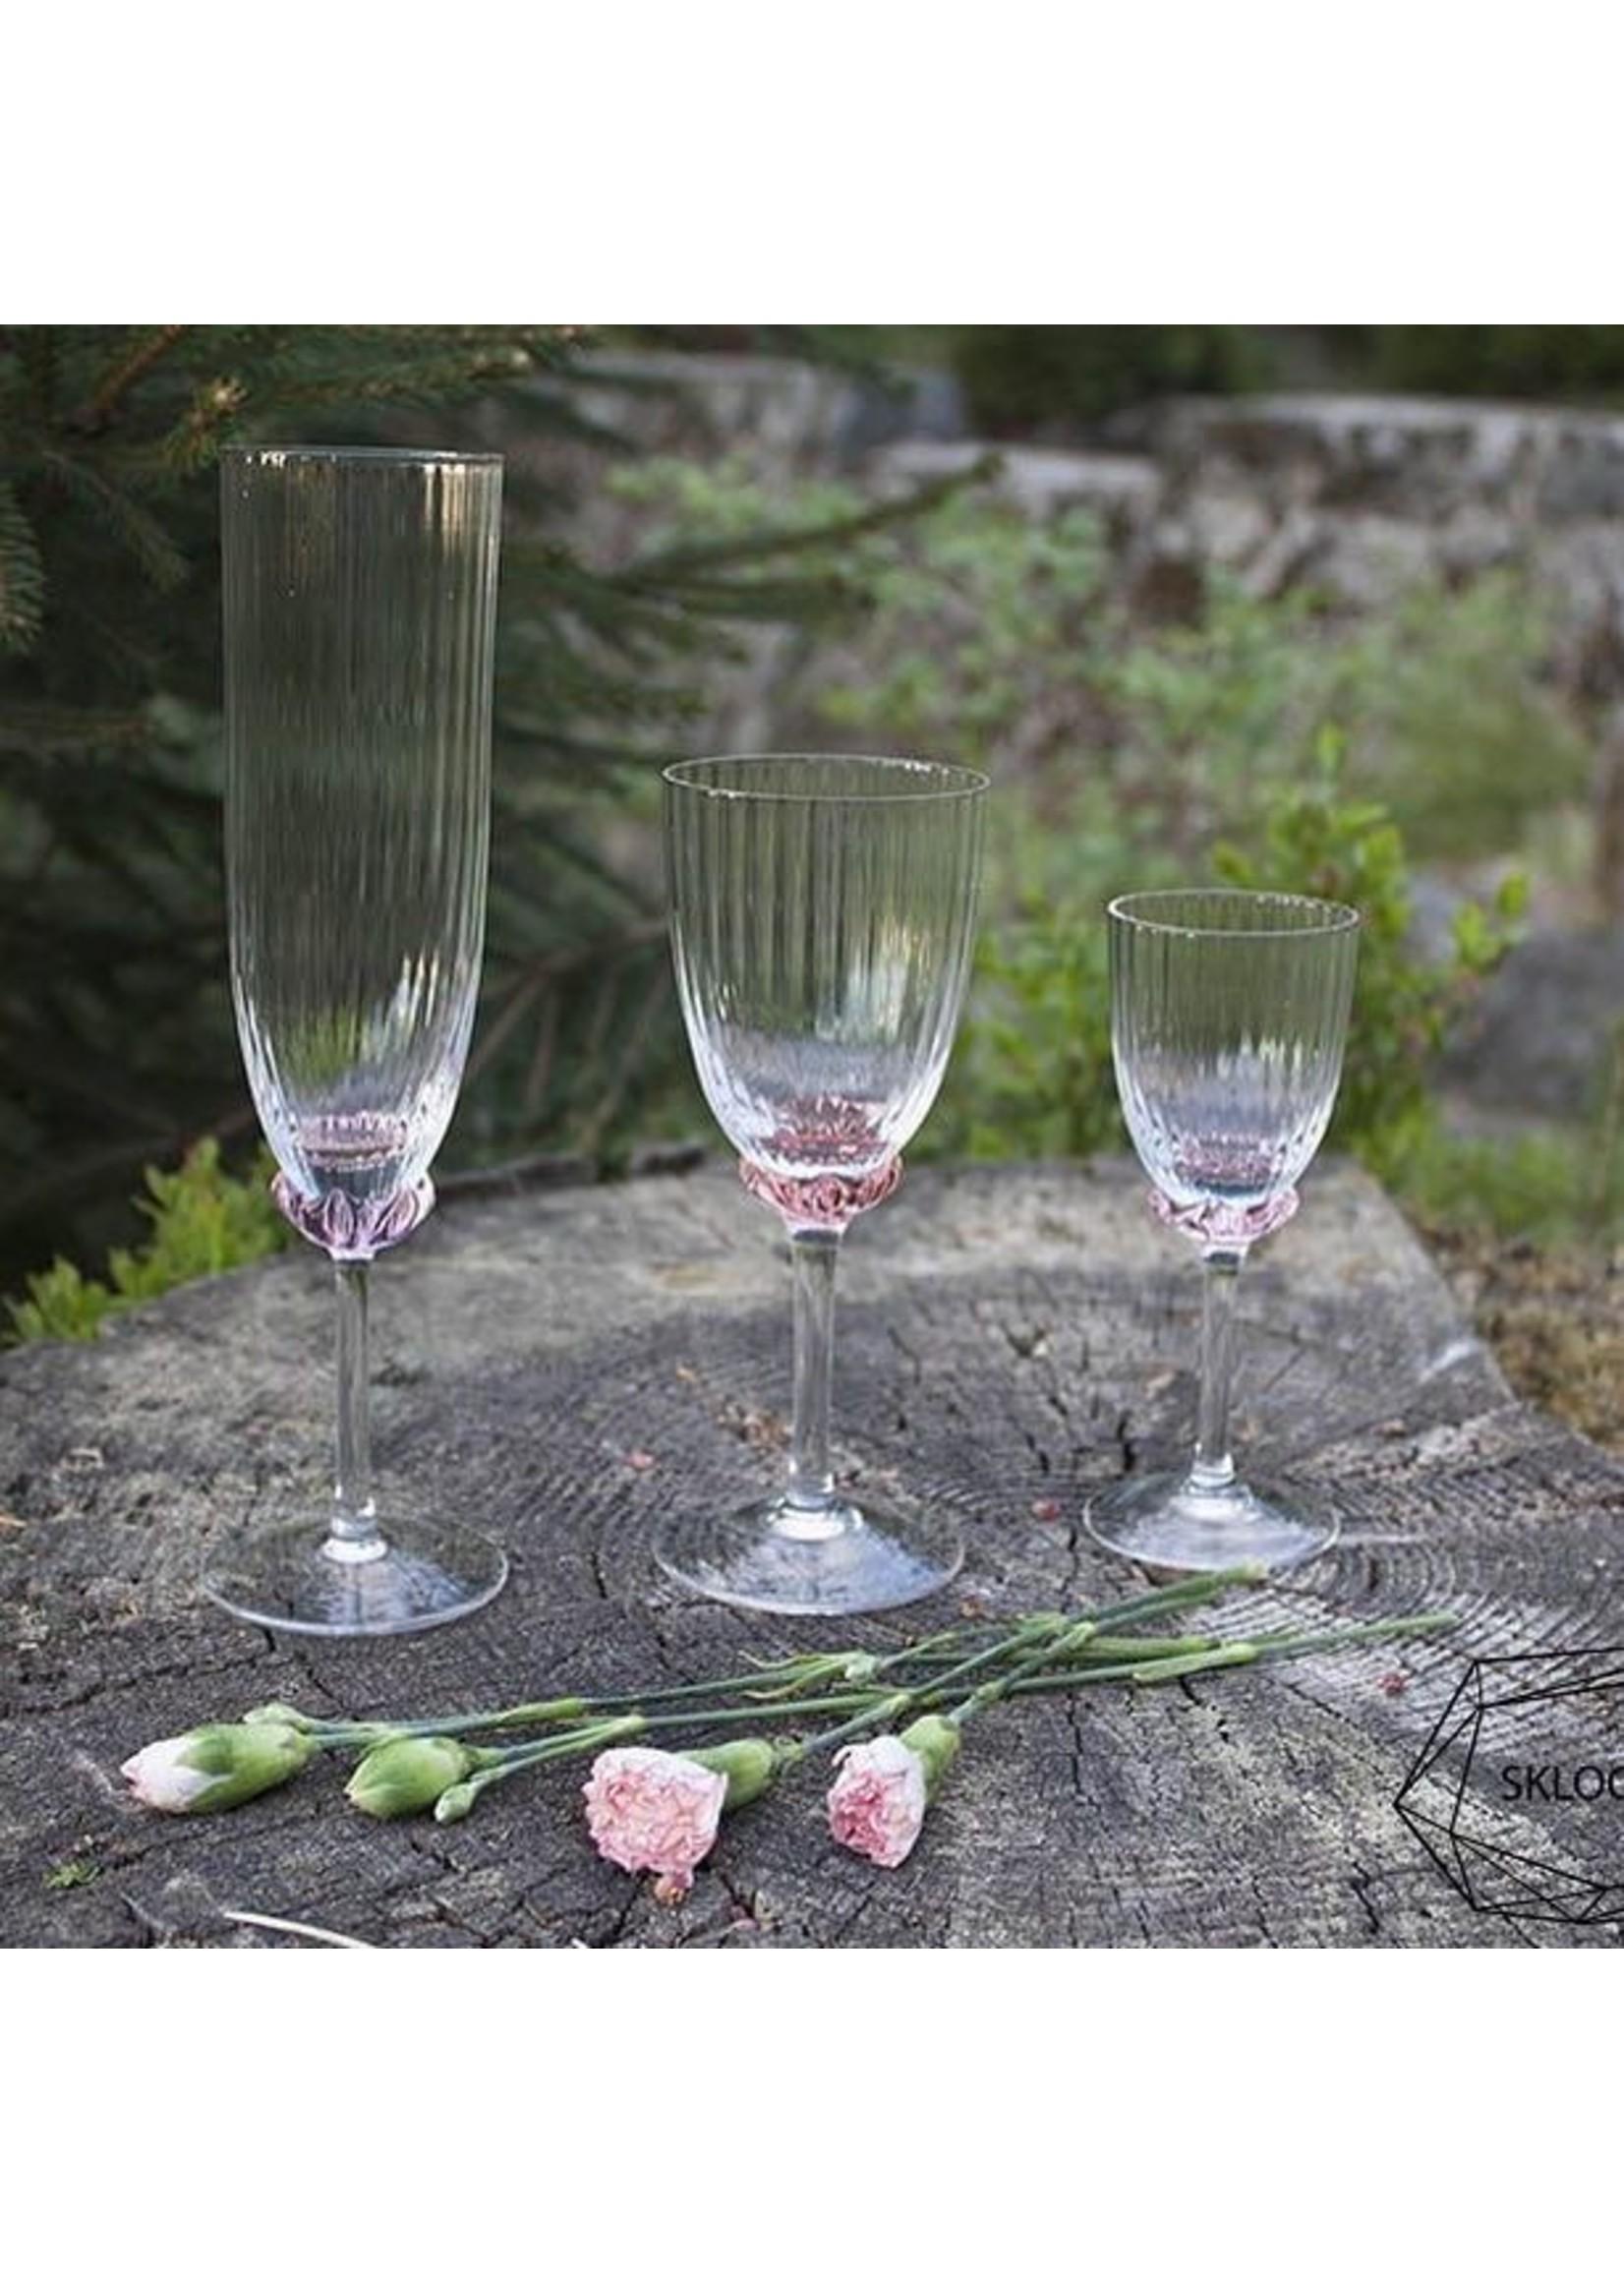 Skloglass Sakura wijnglas / 2st